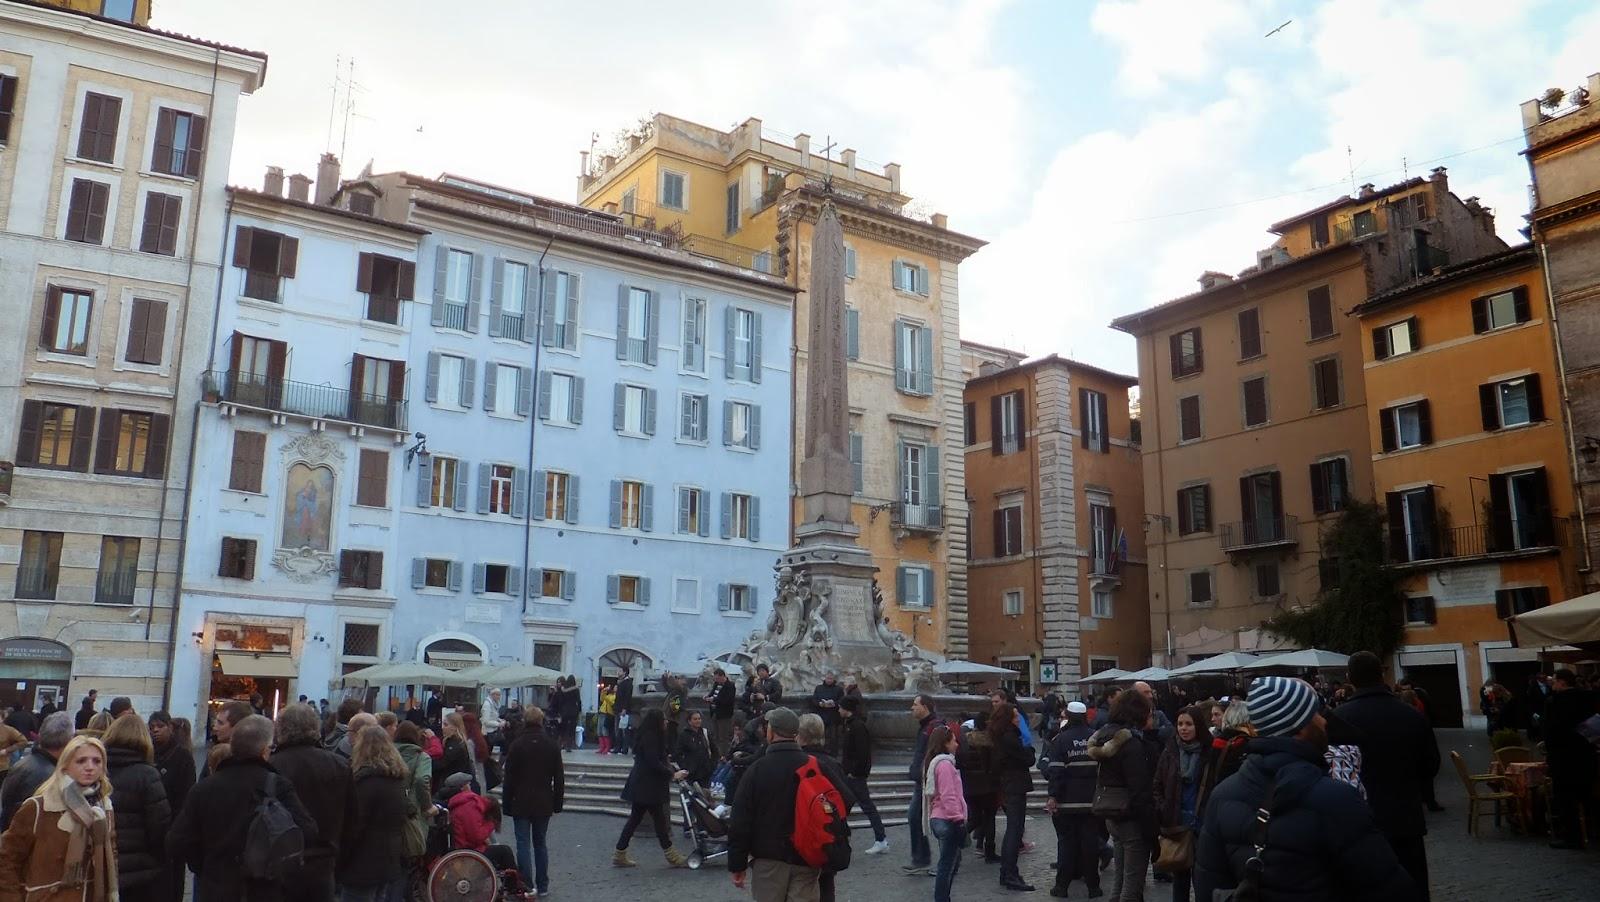 Piazza della Rotonda, Roma, Italia, Elisa N, Blog de Viajes, Lifestyle, Travel